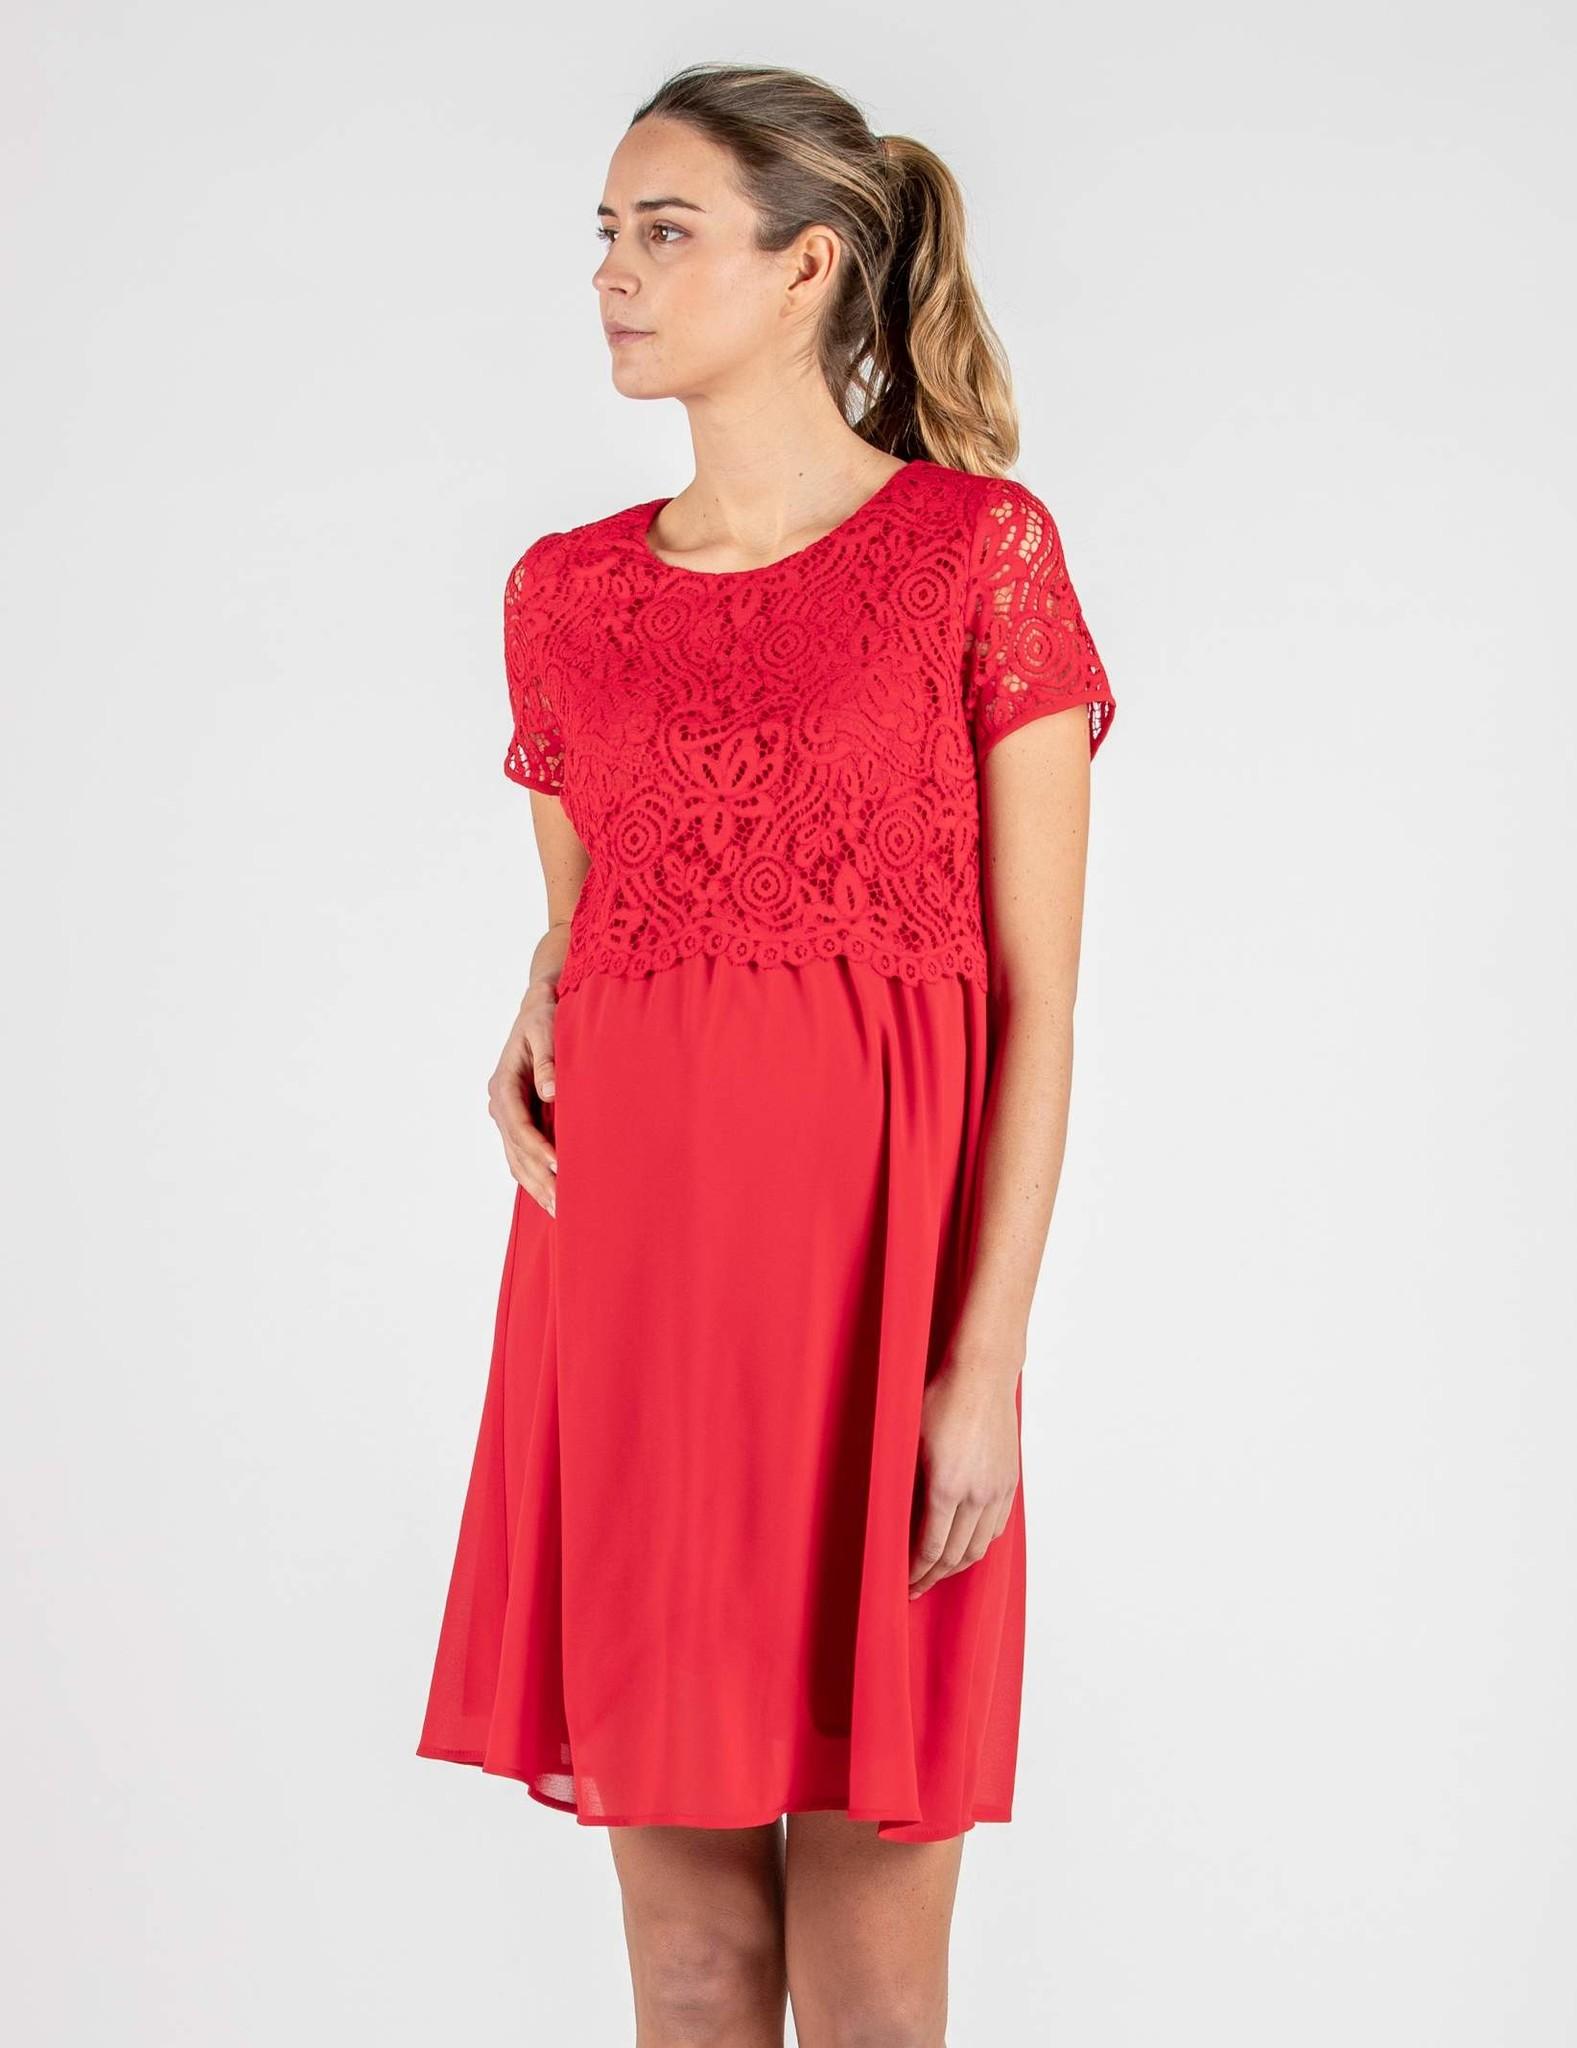 kurzärmliges Umstandskleid Stillkleid Spitze rot